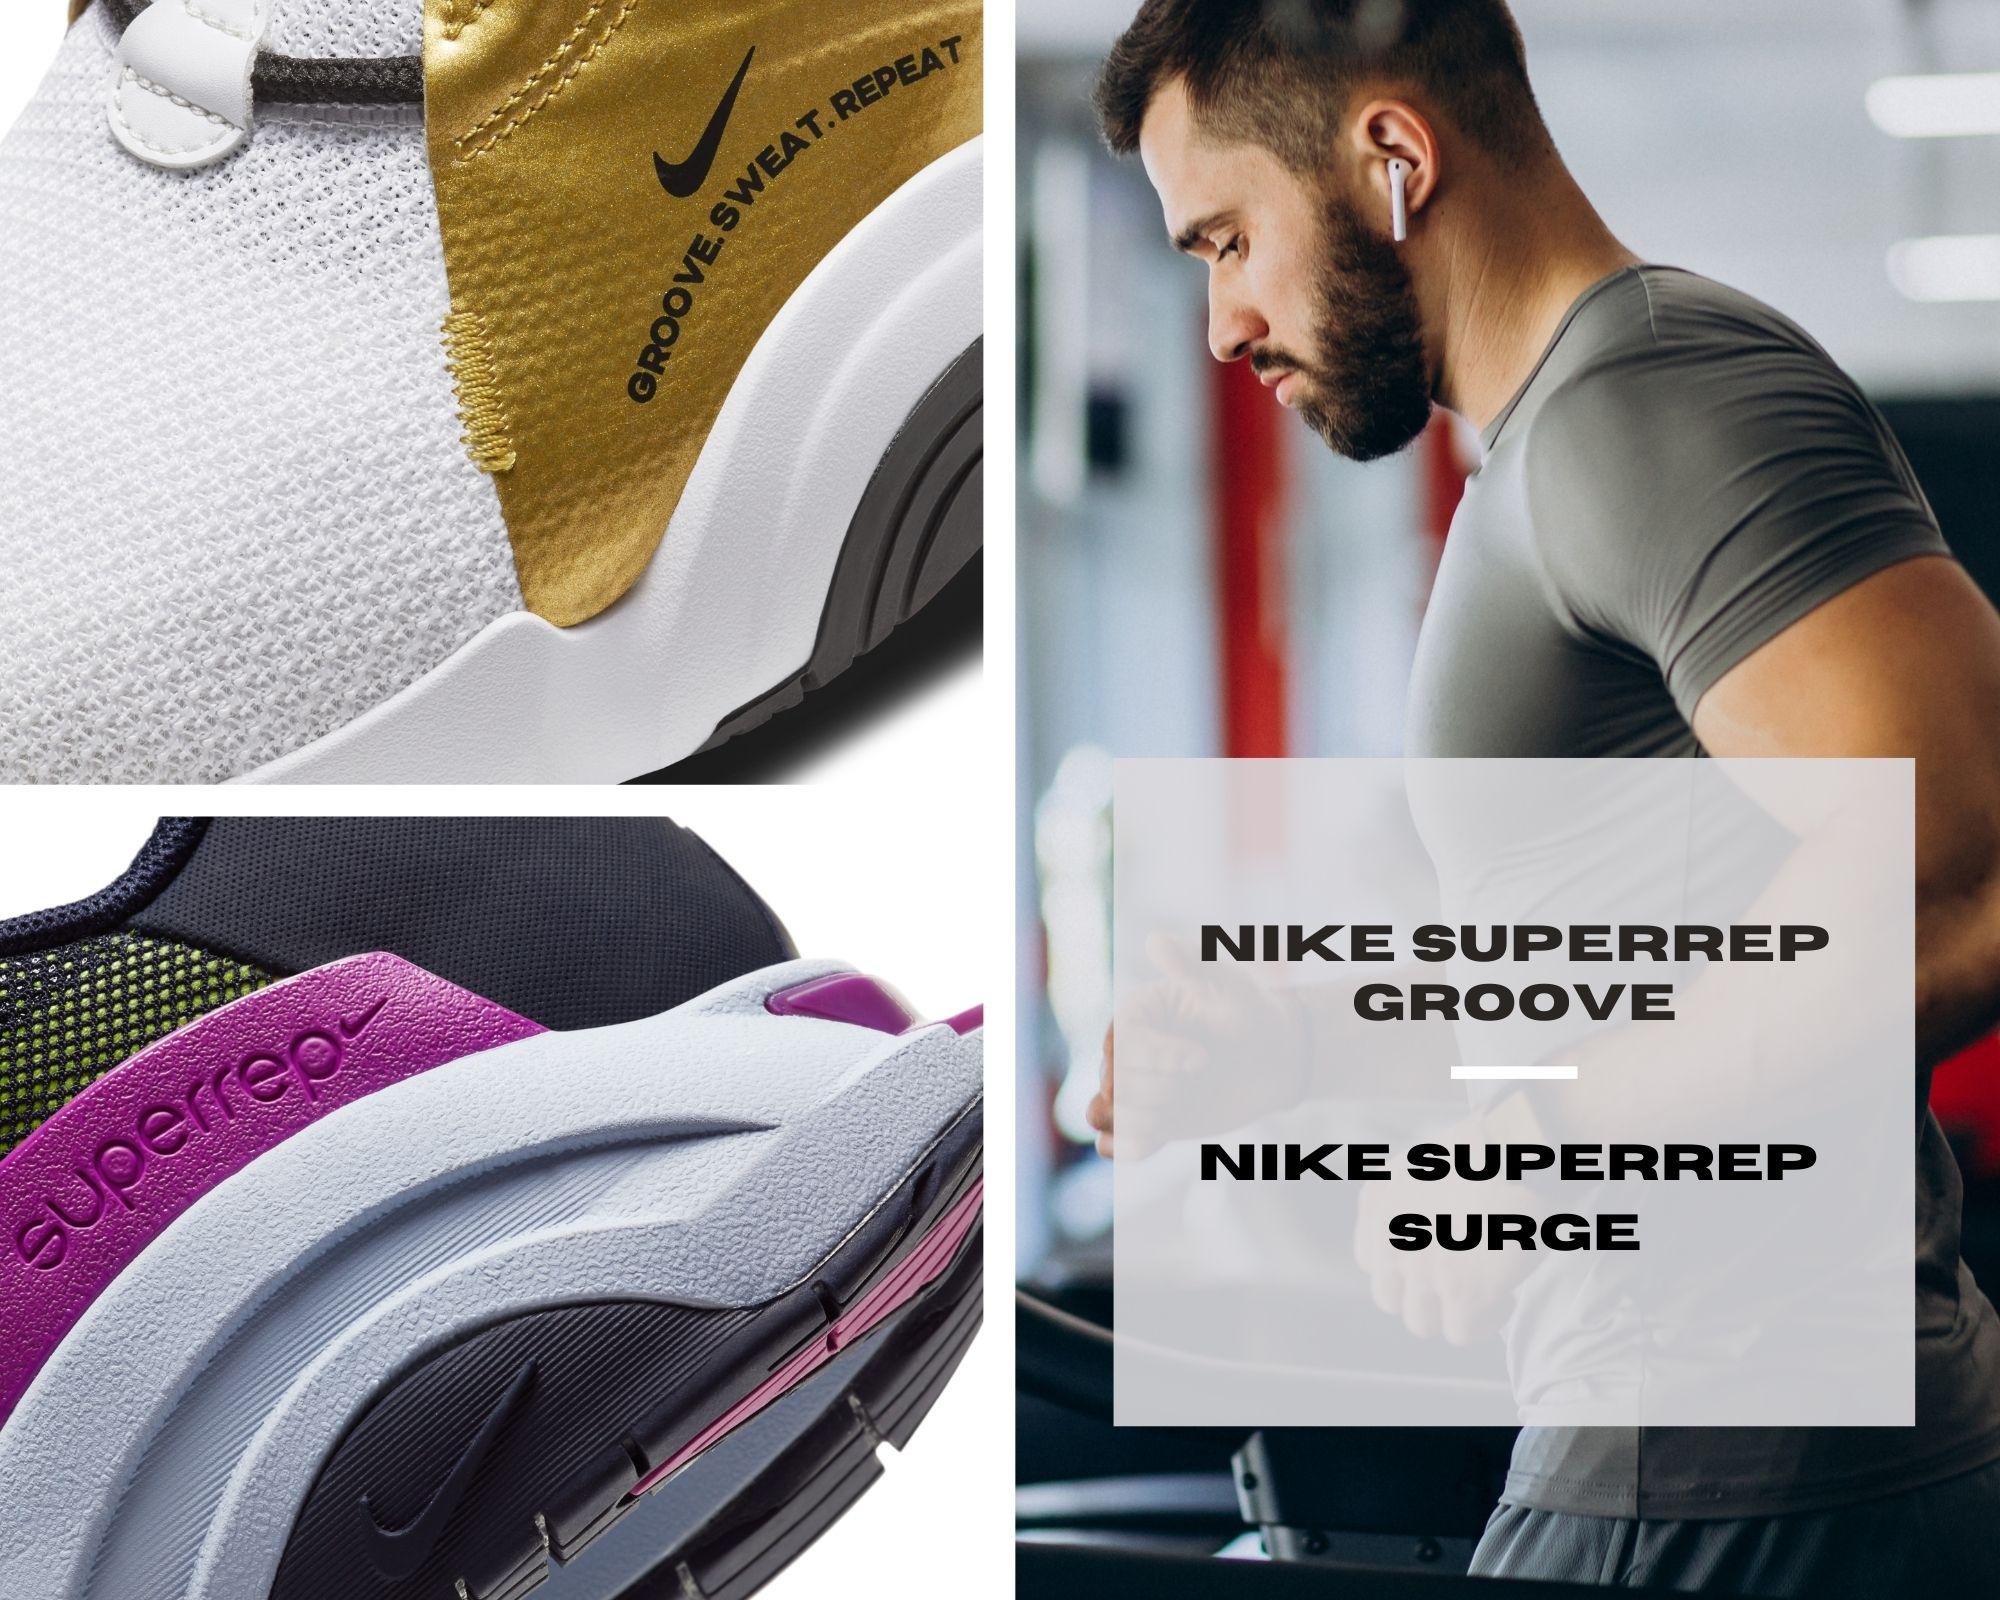 Nike SuperRep Groove & Nike SuperRep Surge